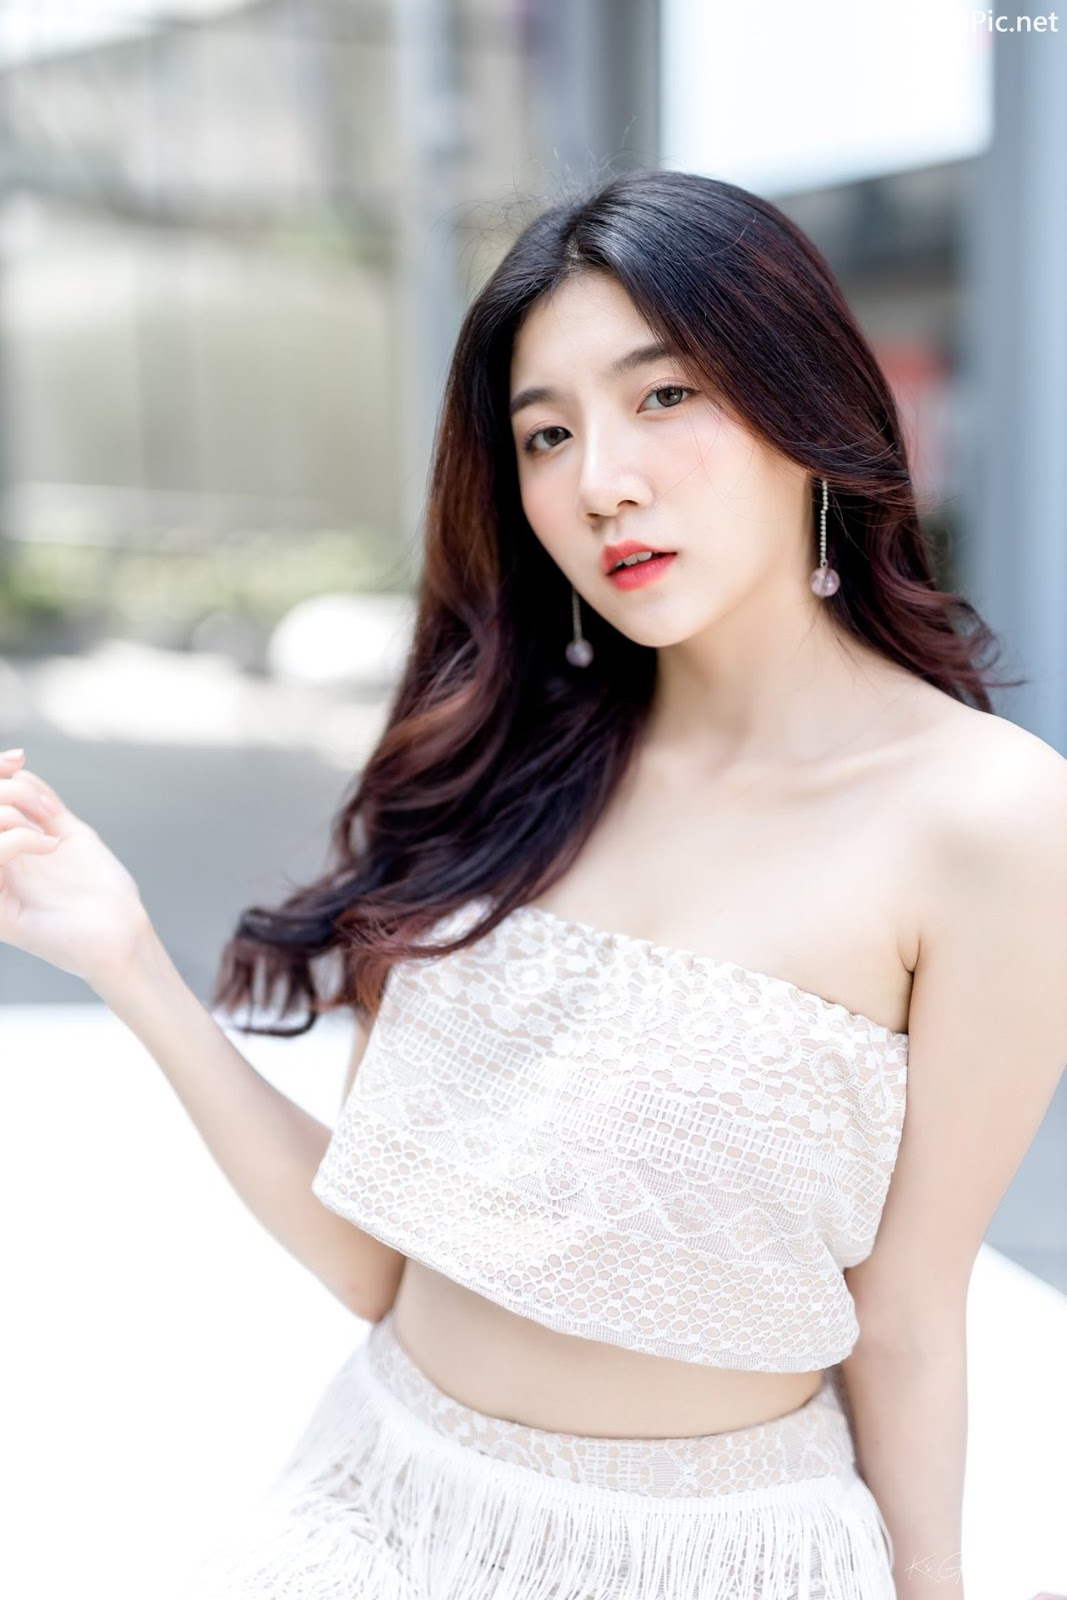 Image Thailand Model - Sasi Ngiunwan - At CentralPlaza Lardprao - TruePic.net - Picture-5